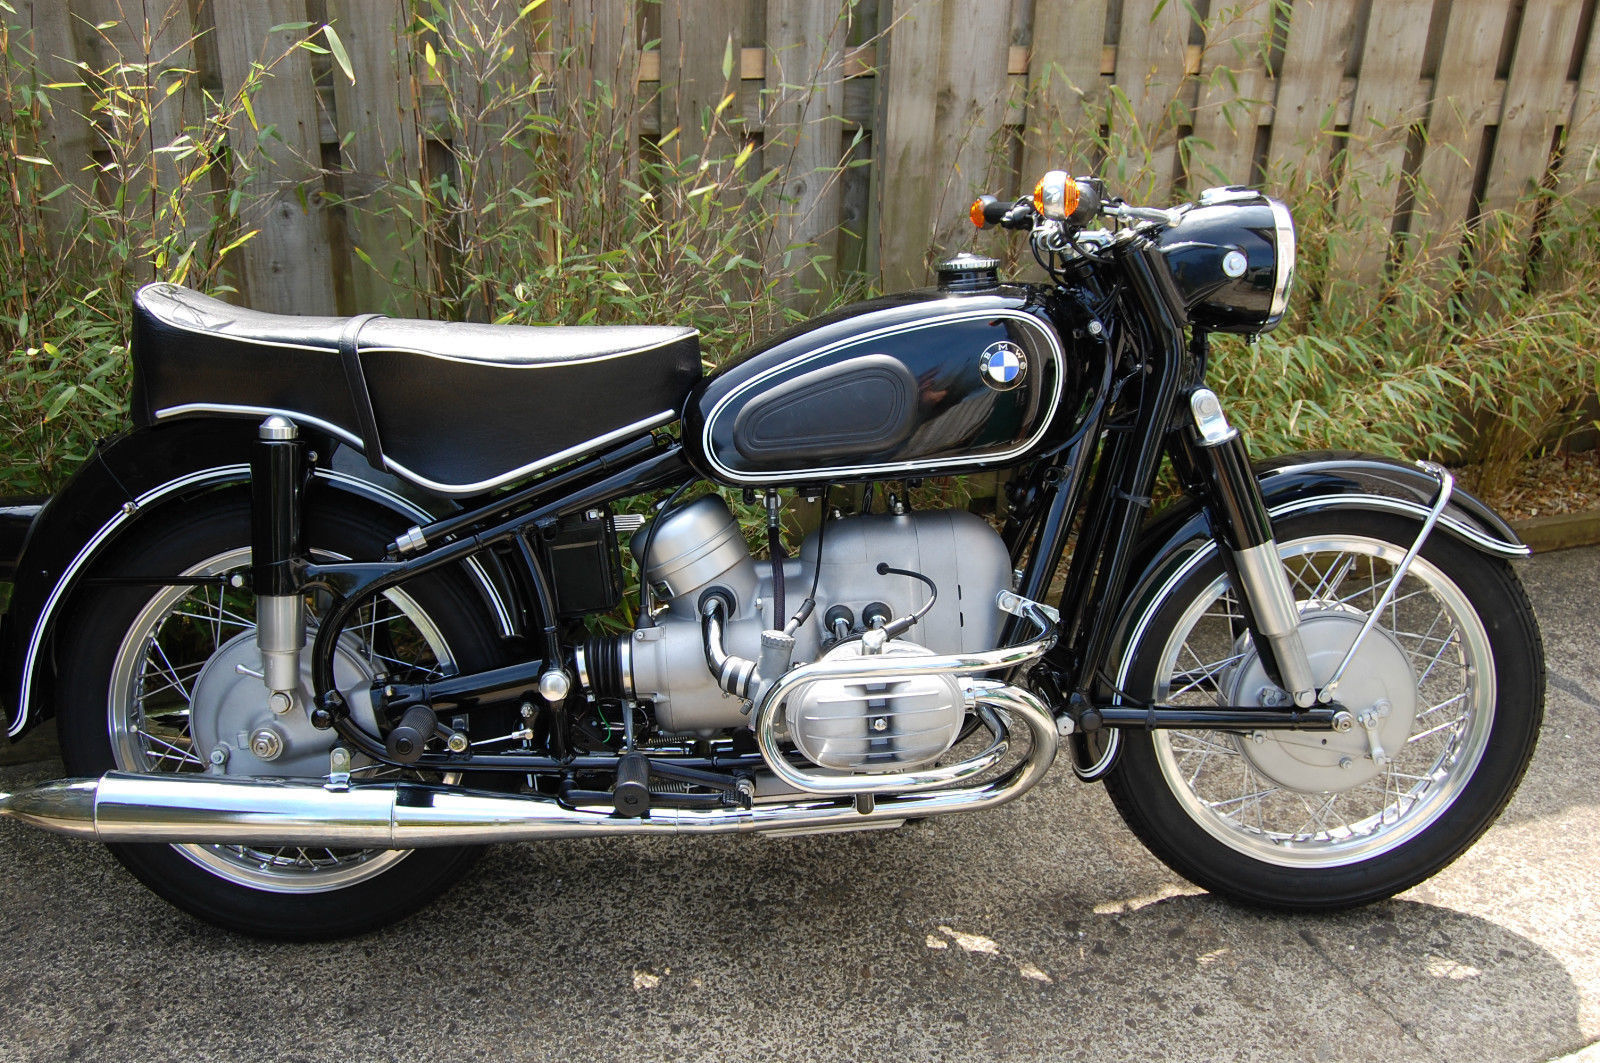 restored bmw r60 2 1965 photographs at classic bikes. Black Bedroom Furniture Sets. Home Design Ideas